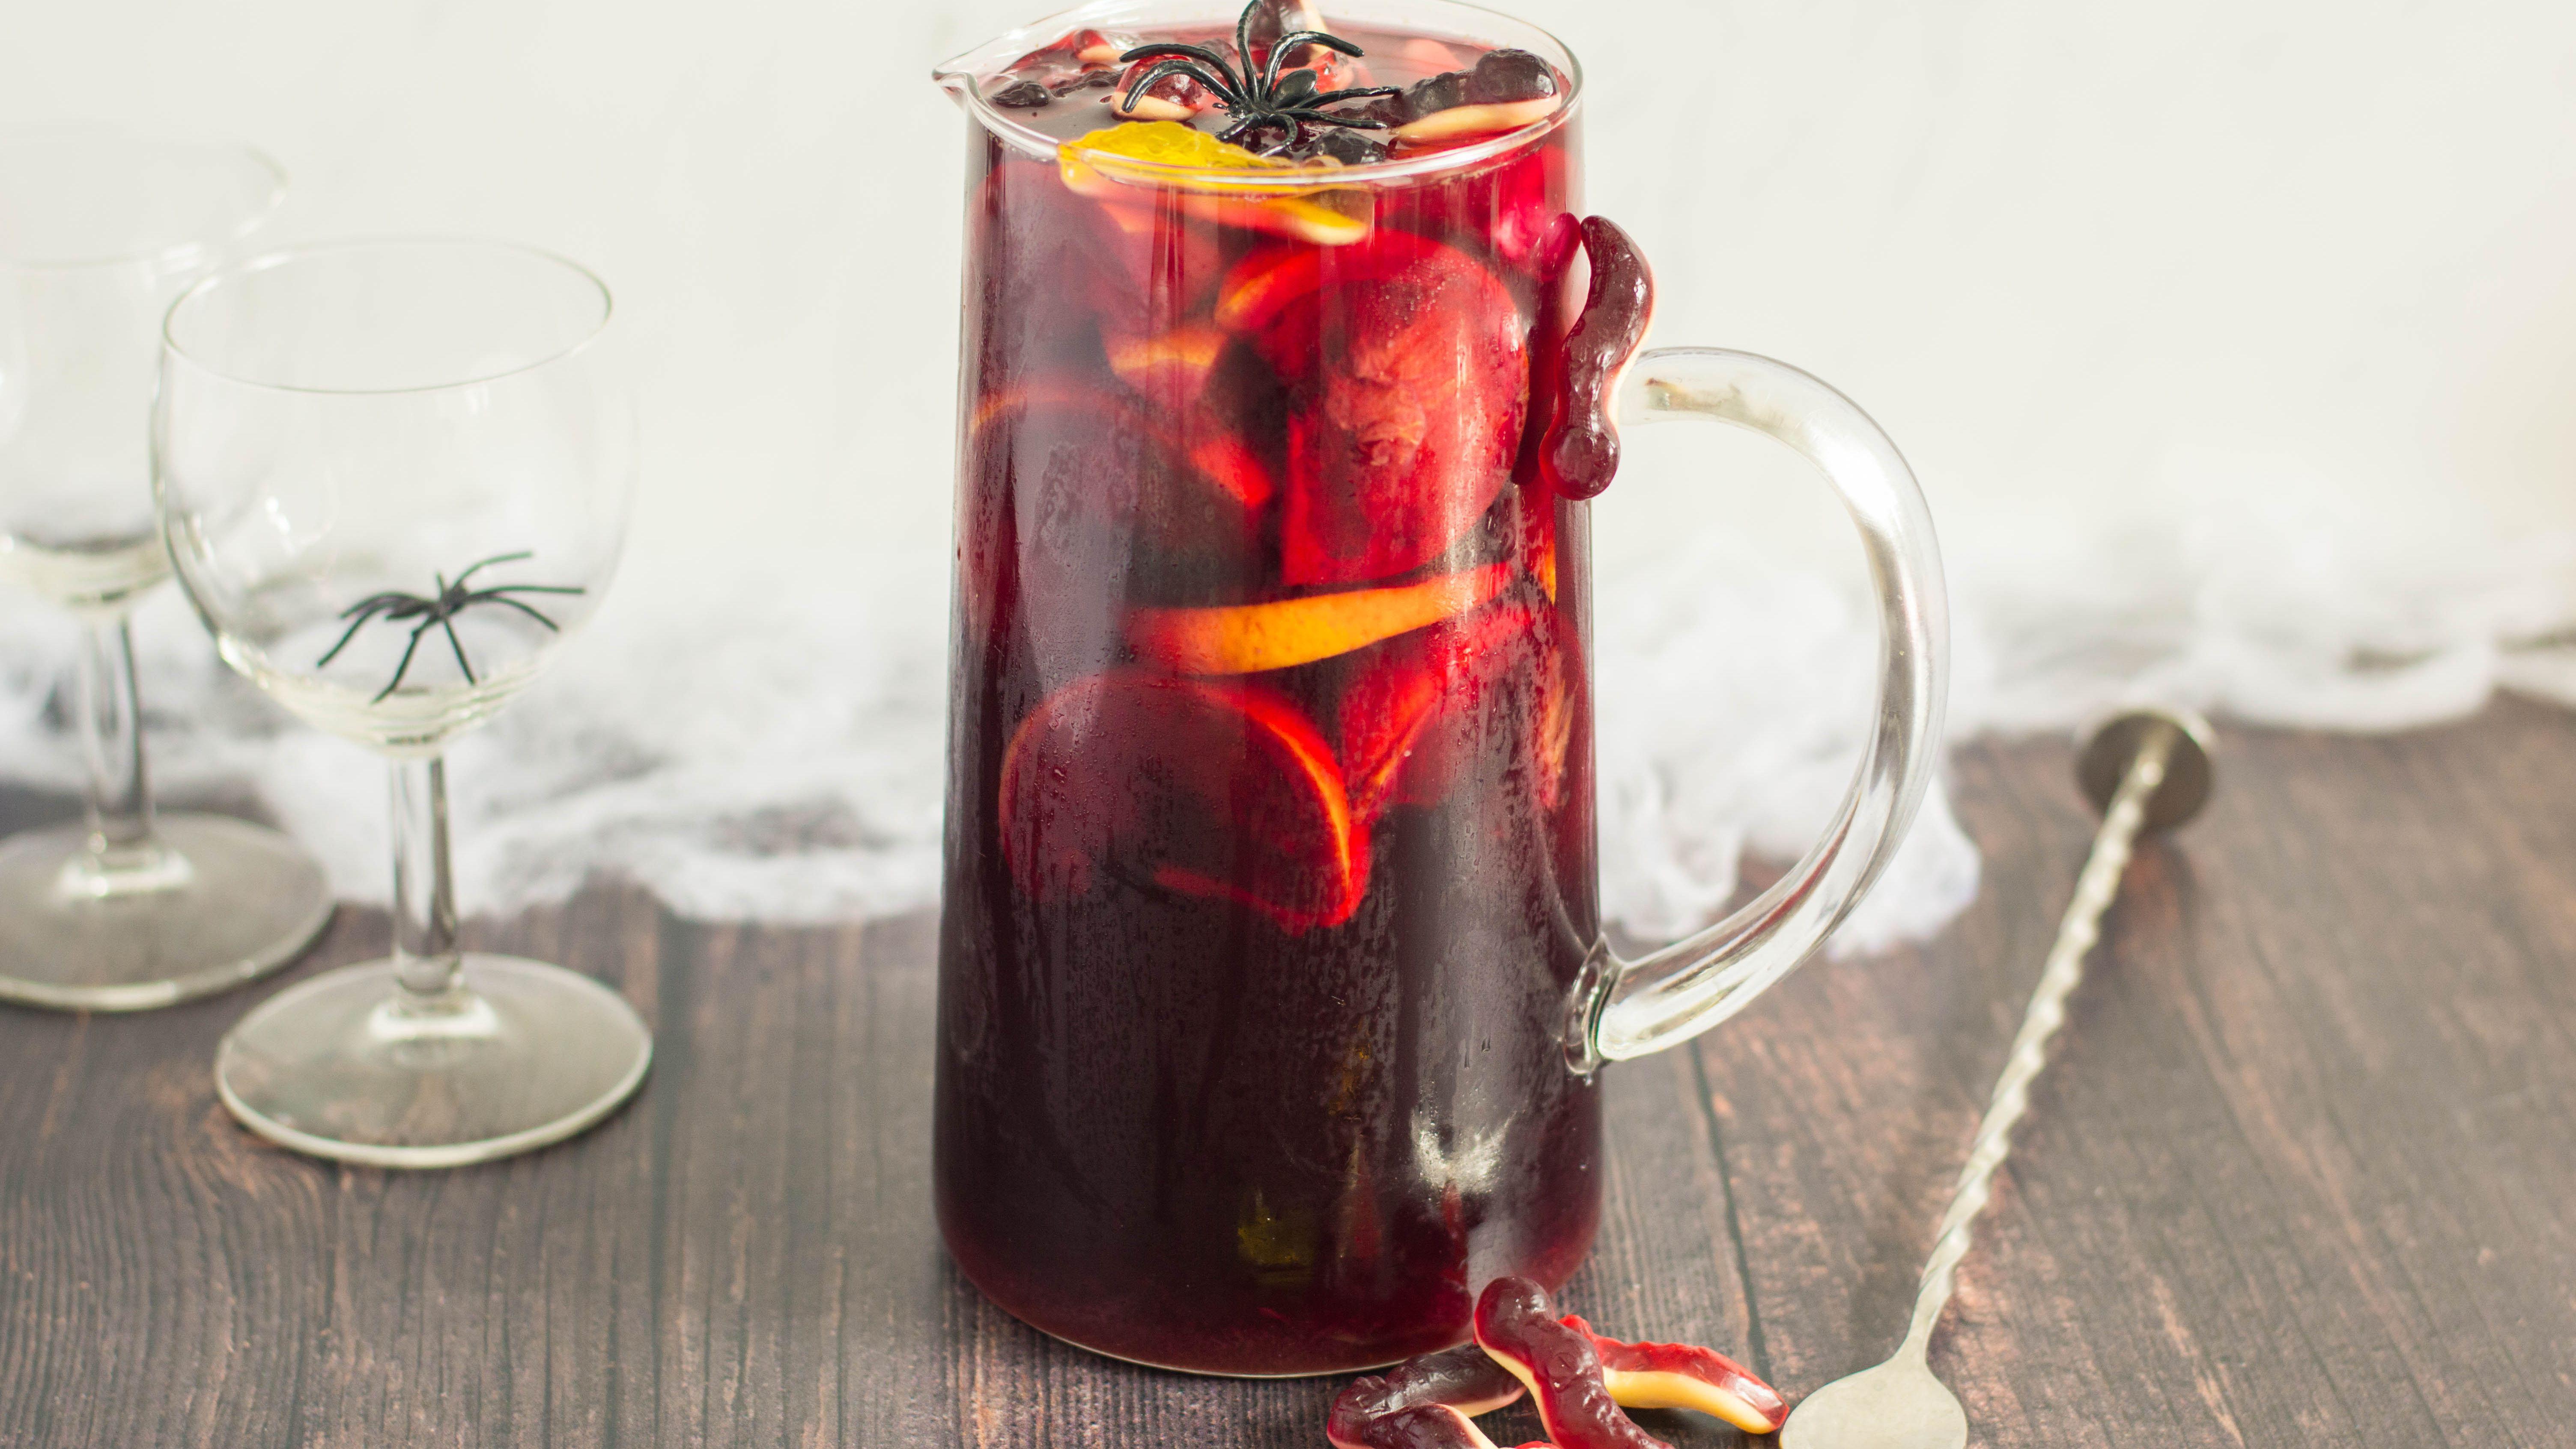 Blood Red Halloween Sangria Recipe